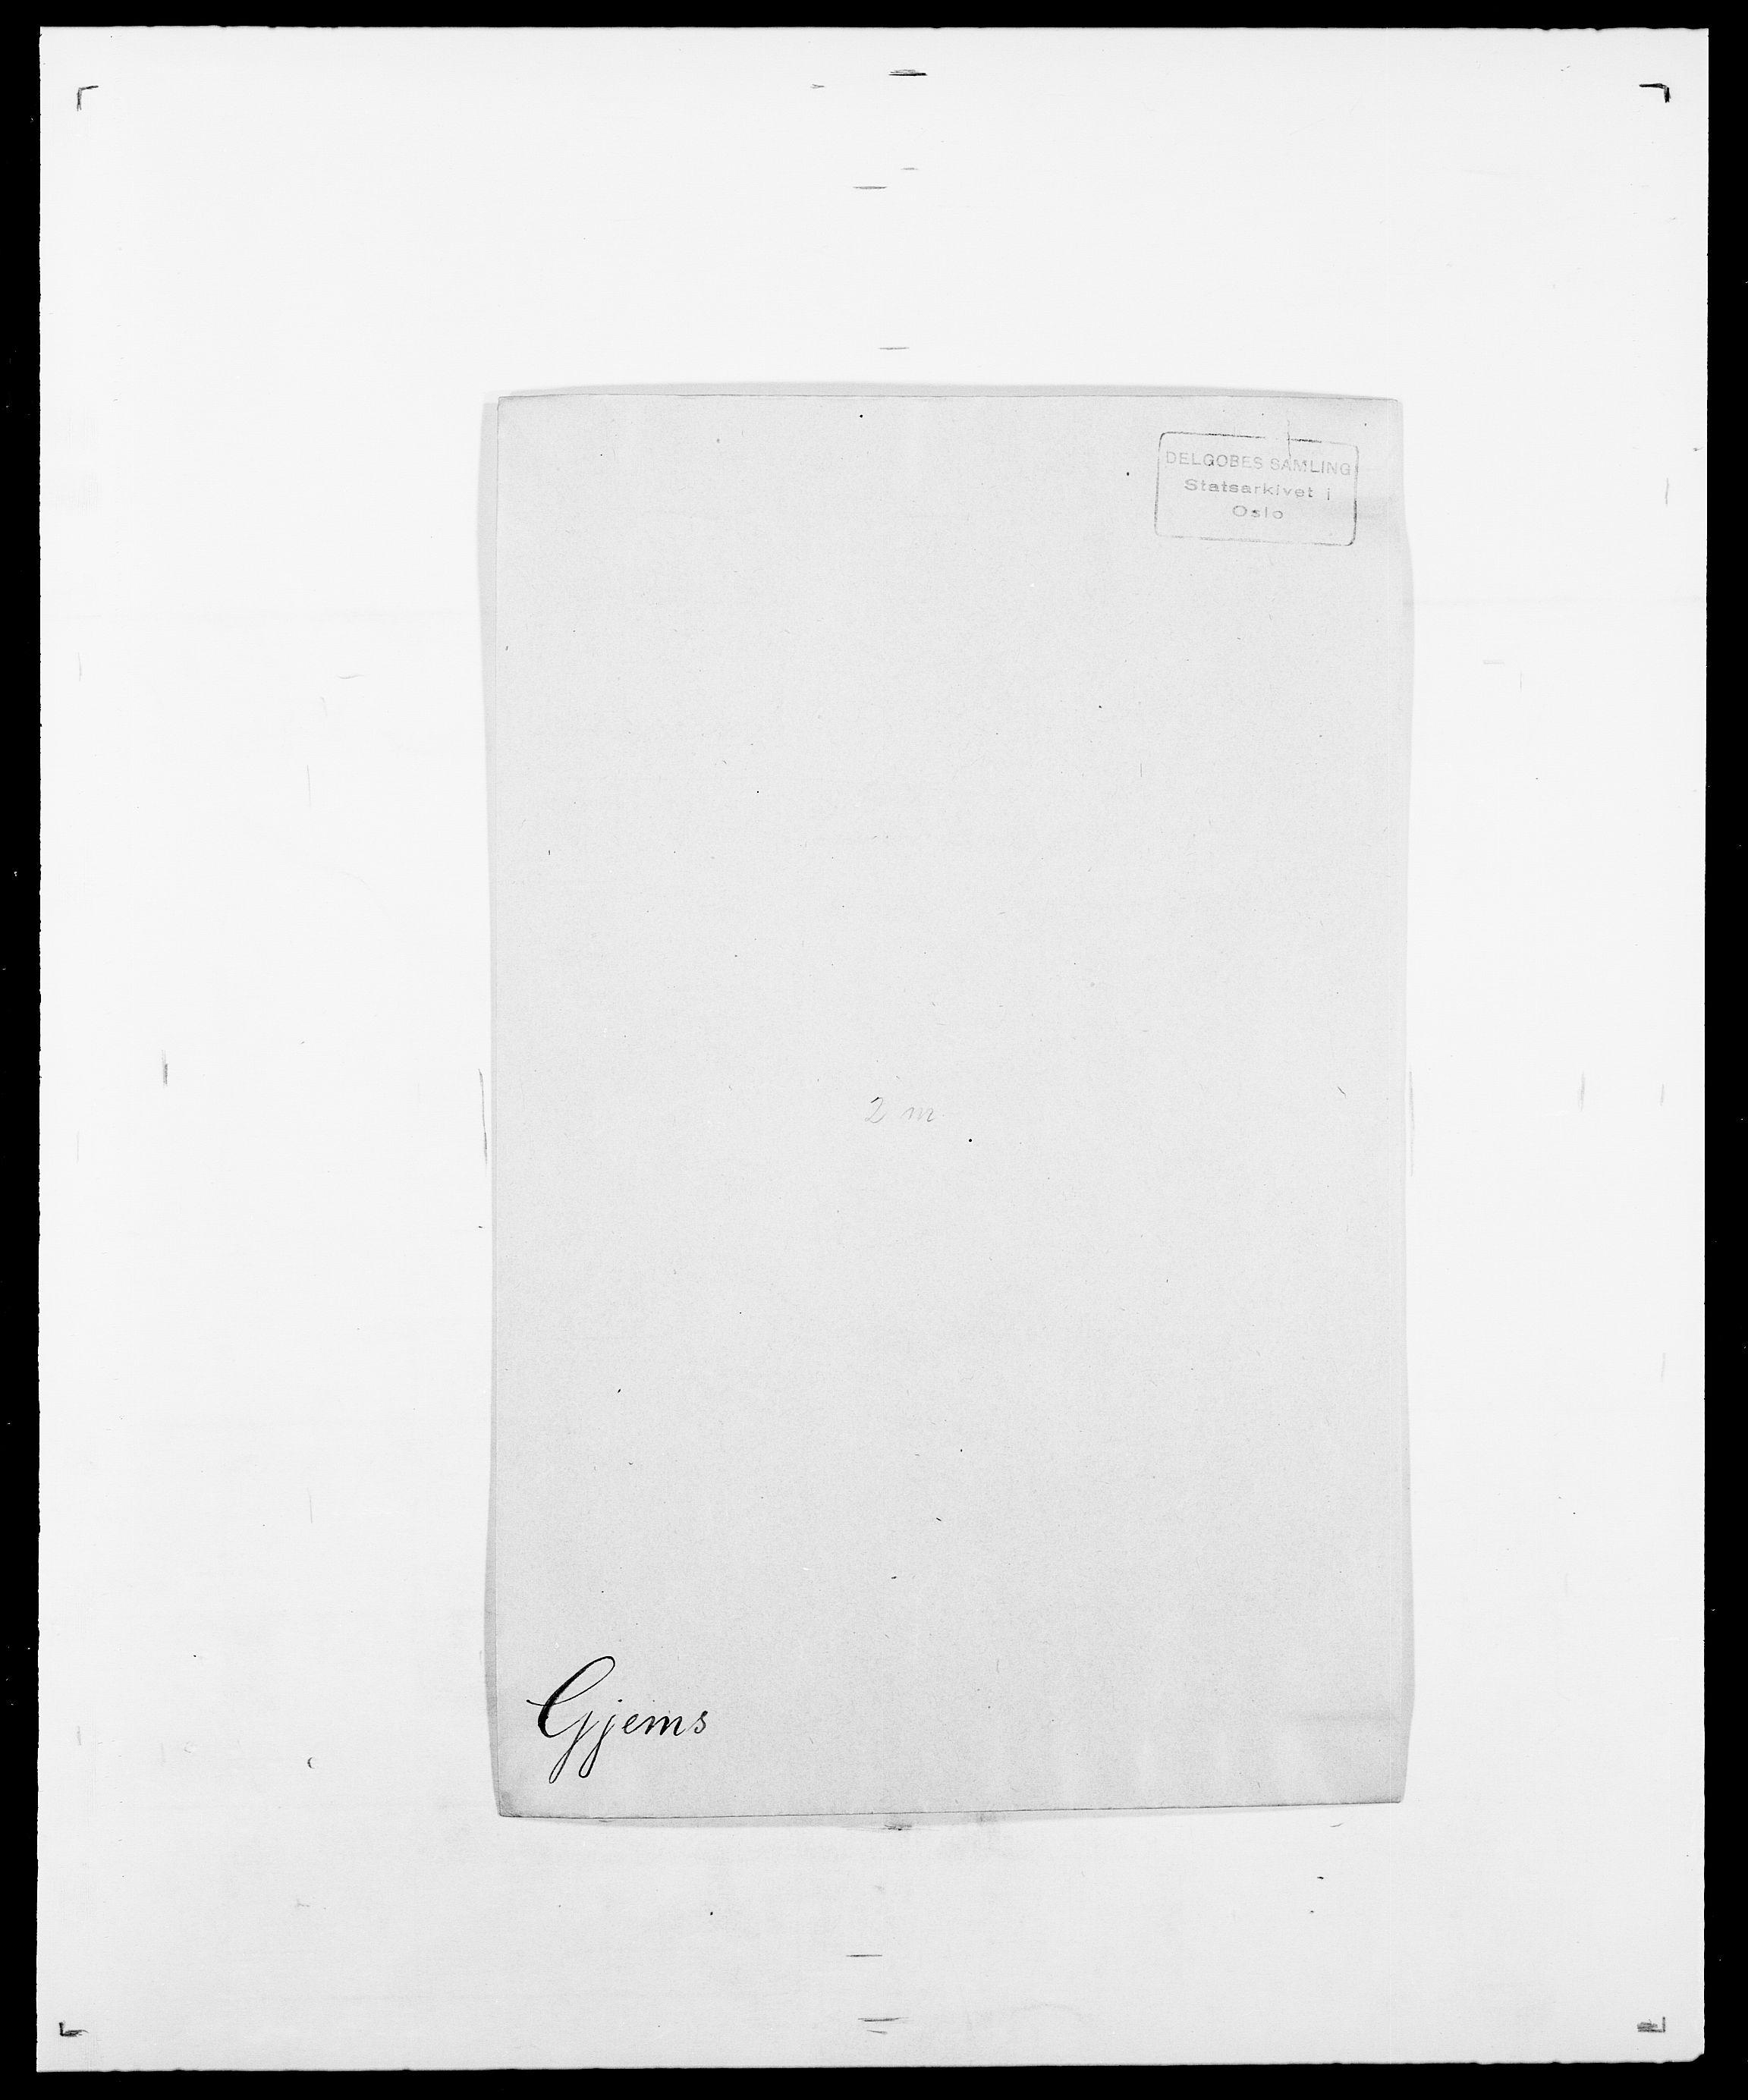 SAO, Delgobe, Charles Antoine - samling, D/Da/L0014: Giebdhausen - Grip, s. 97